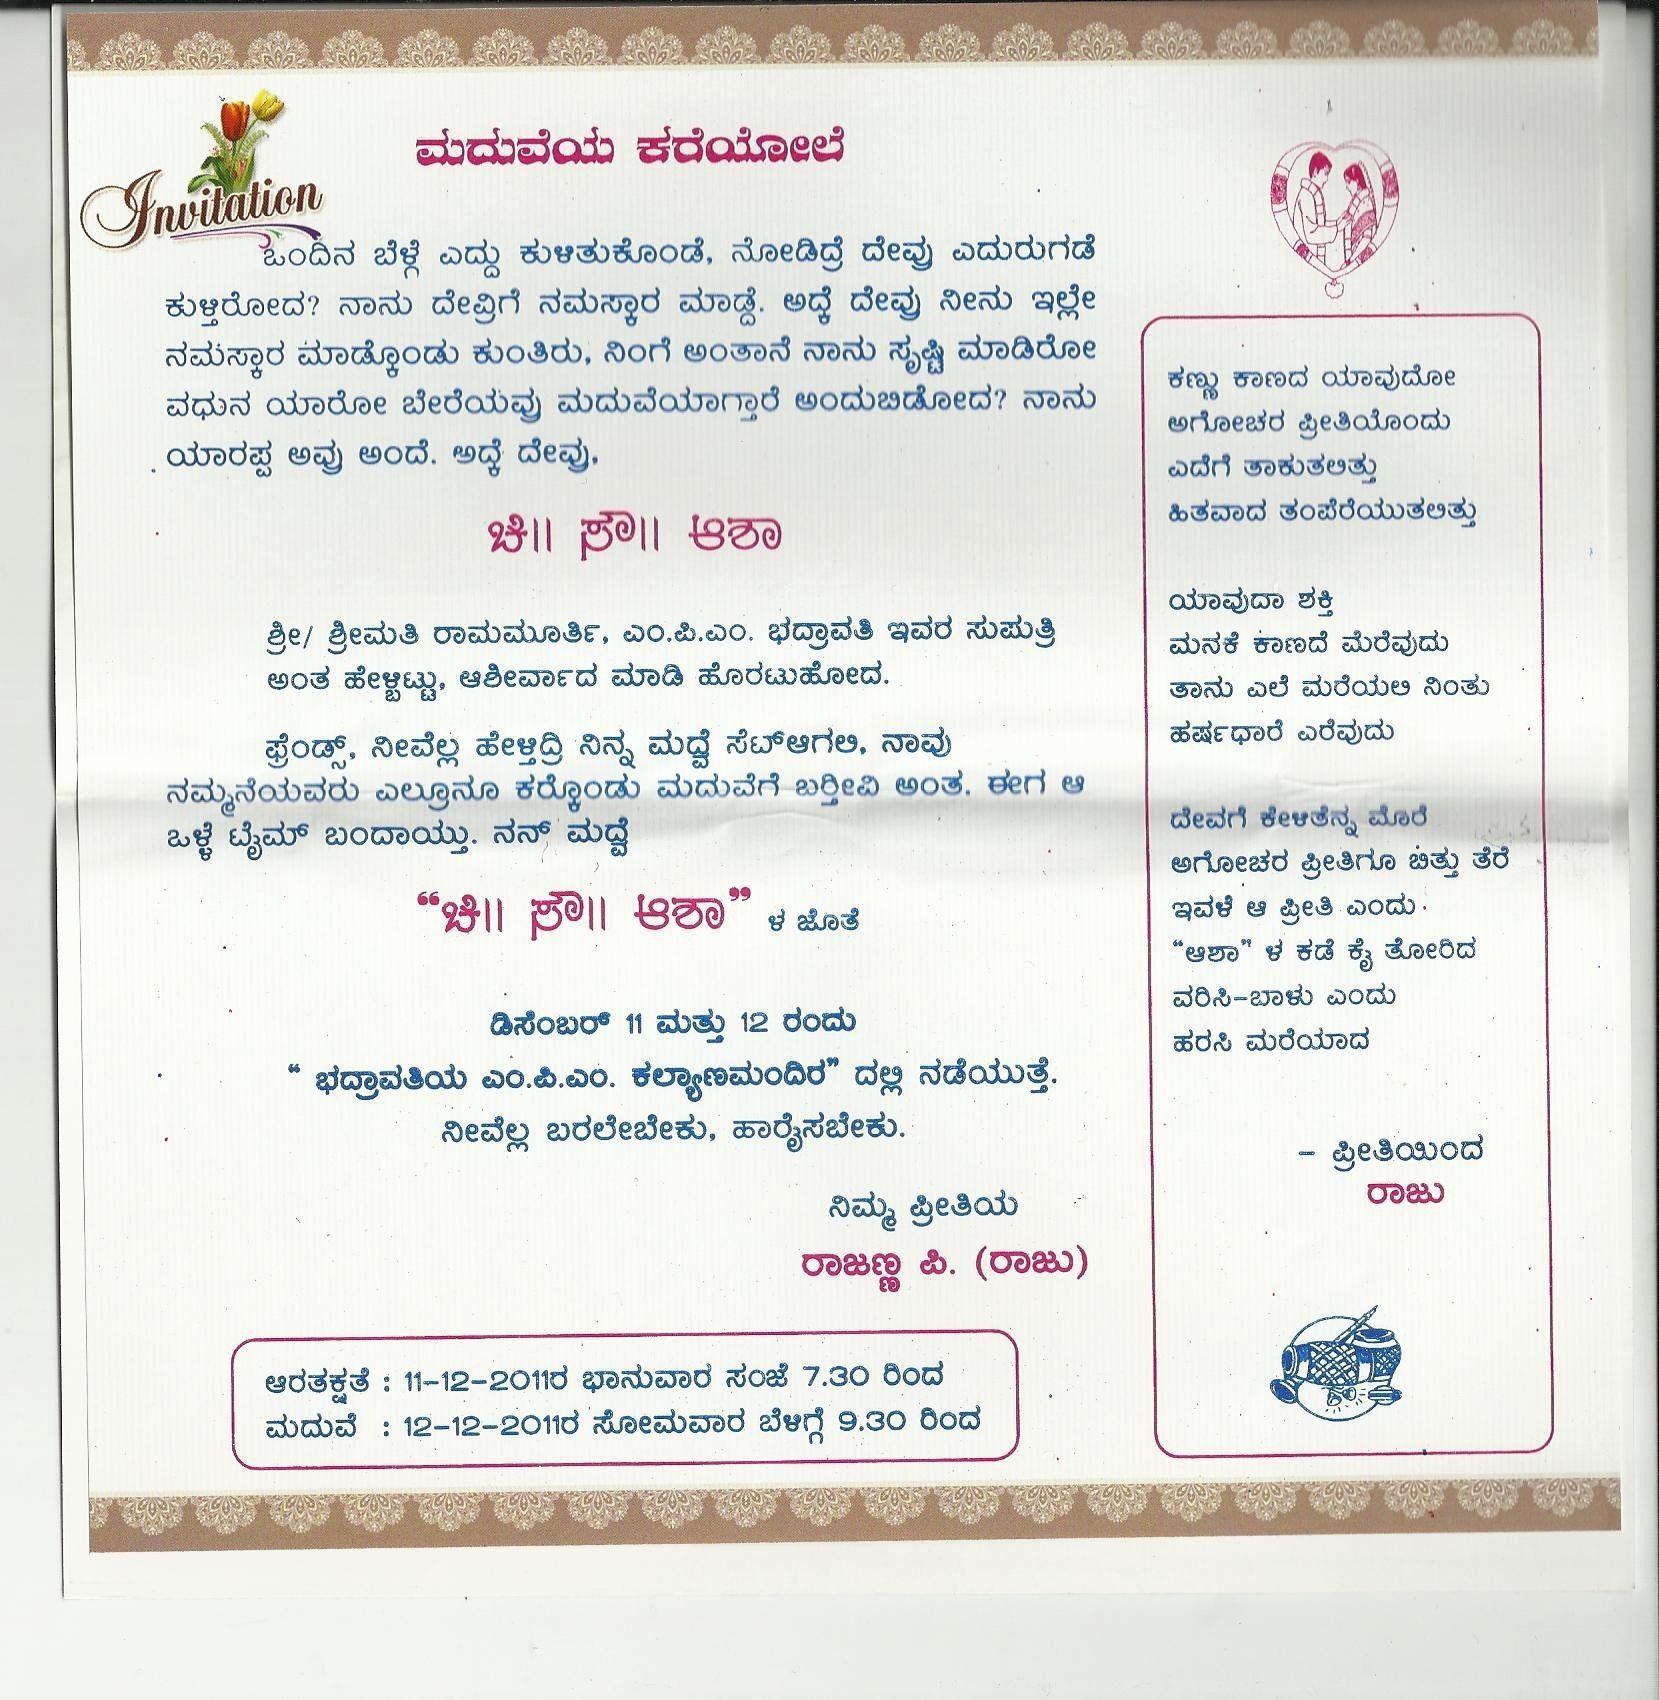 Kannada Wedding Card In 2021 Wedding Card Quotes Wedding Invitation Card Quotes Marriage Invitation Card